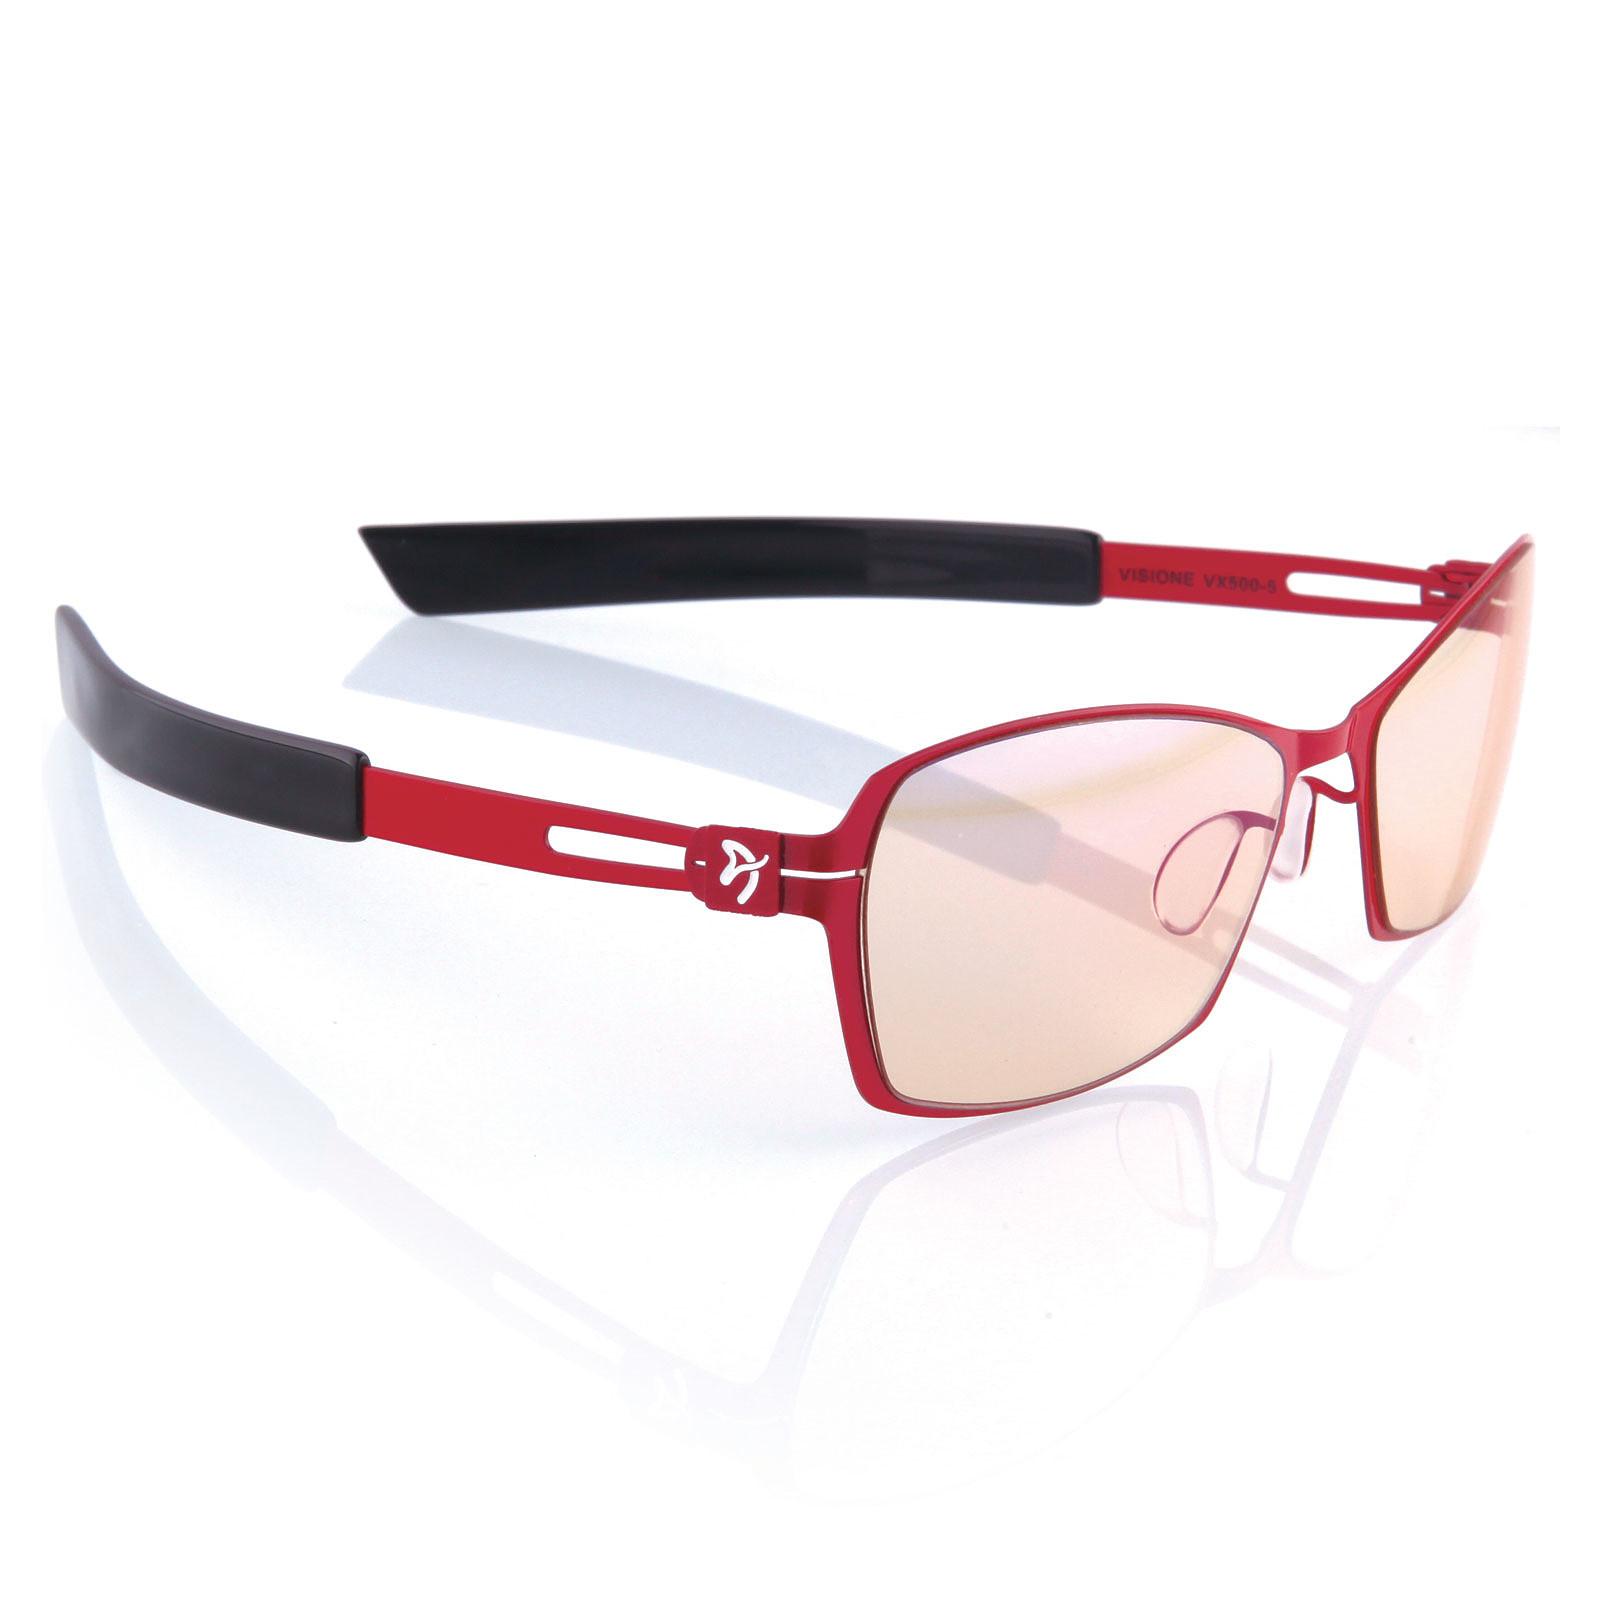 Arozzi Visione VX-500 (Rouge)